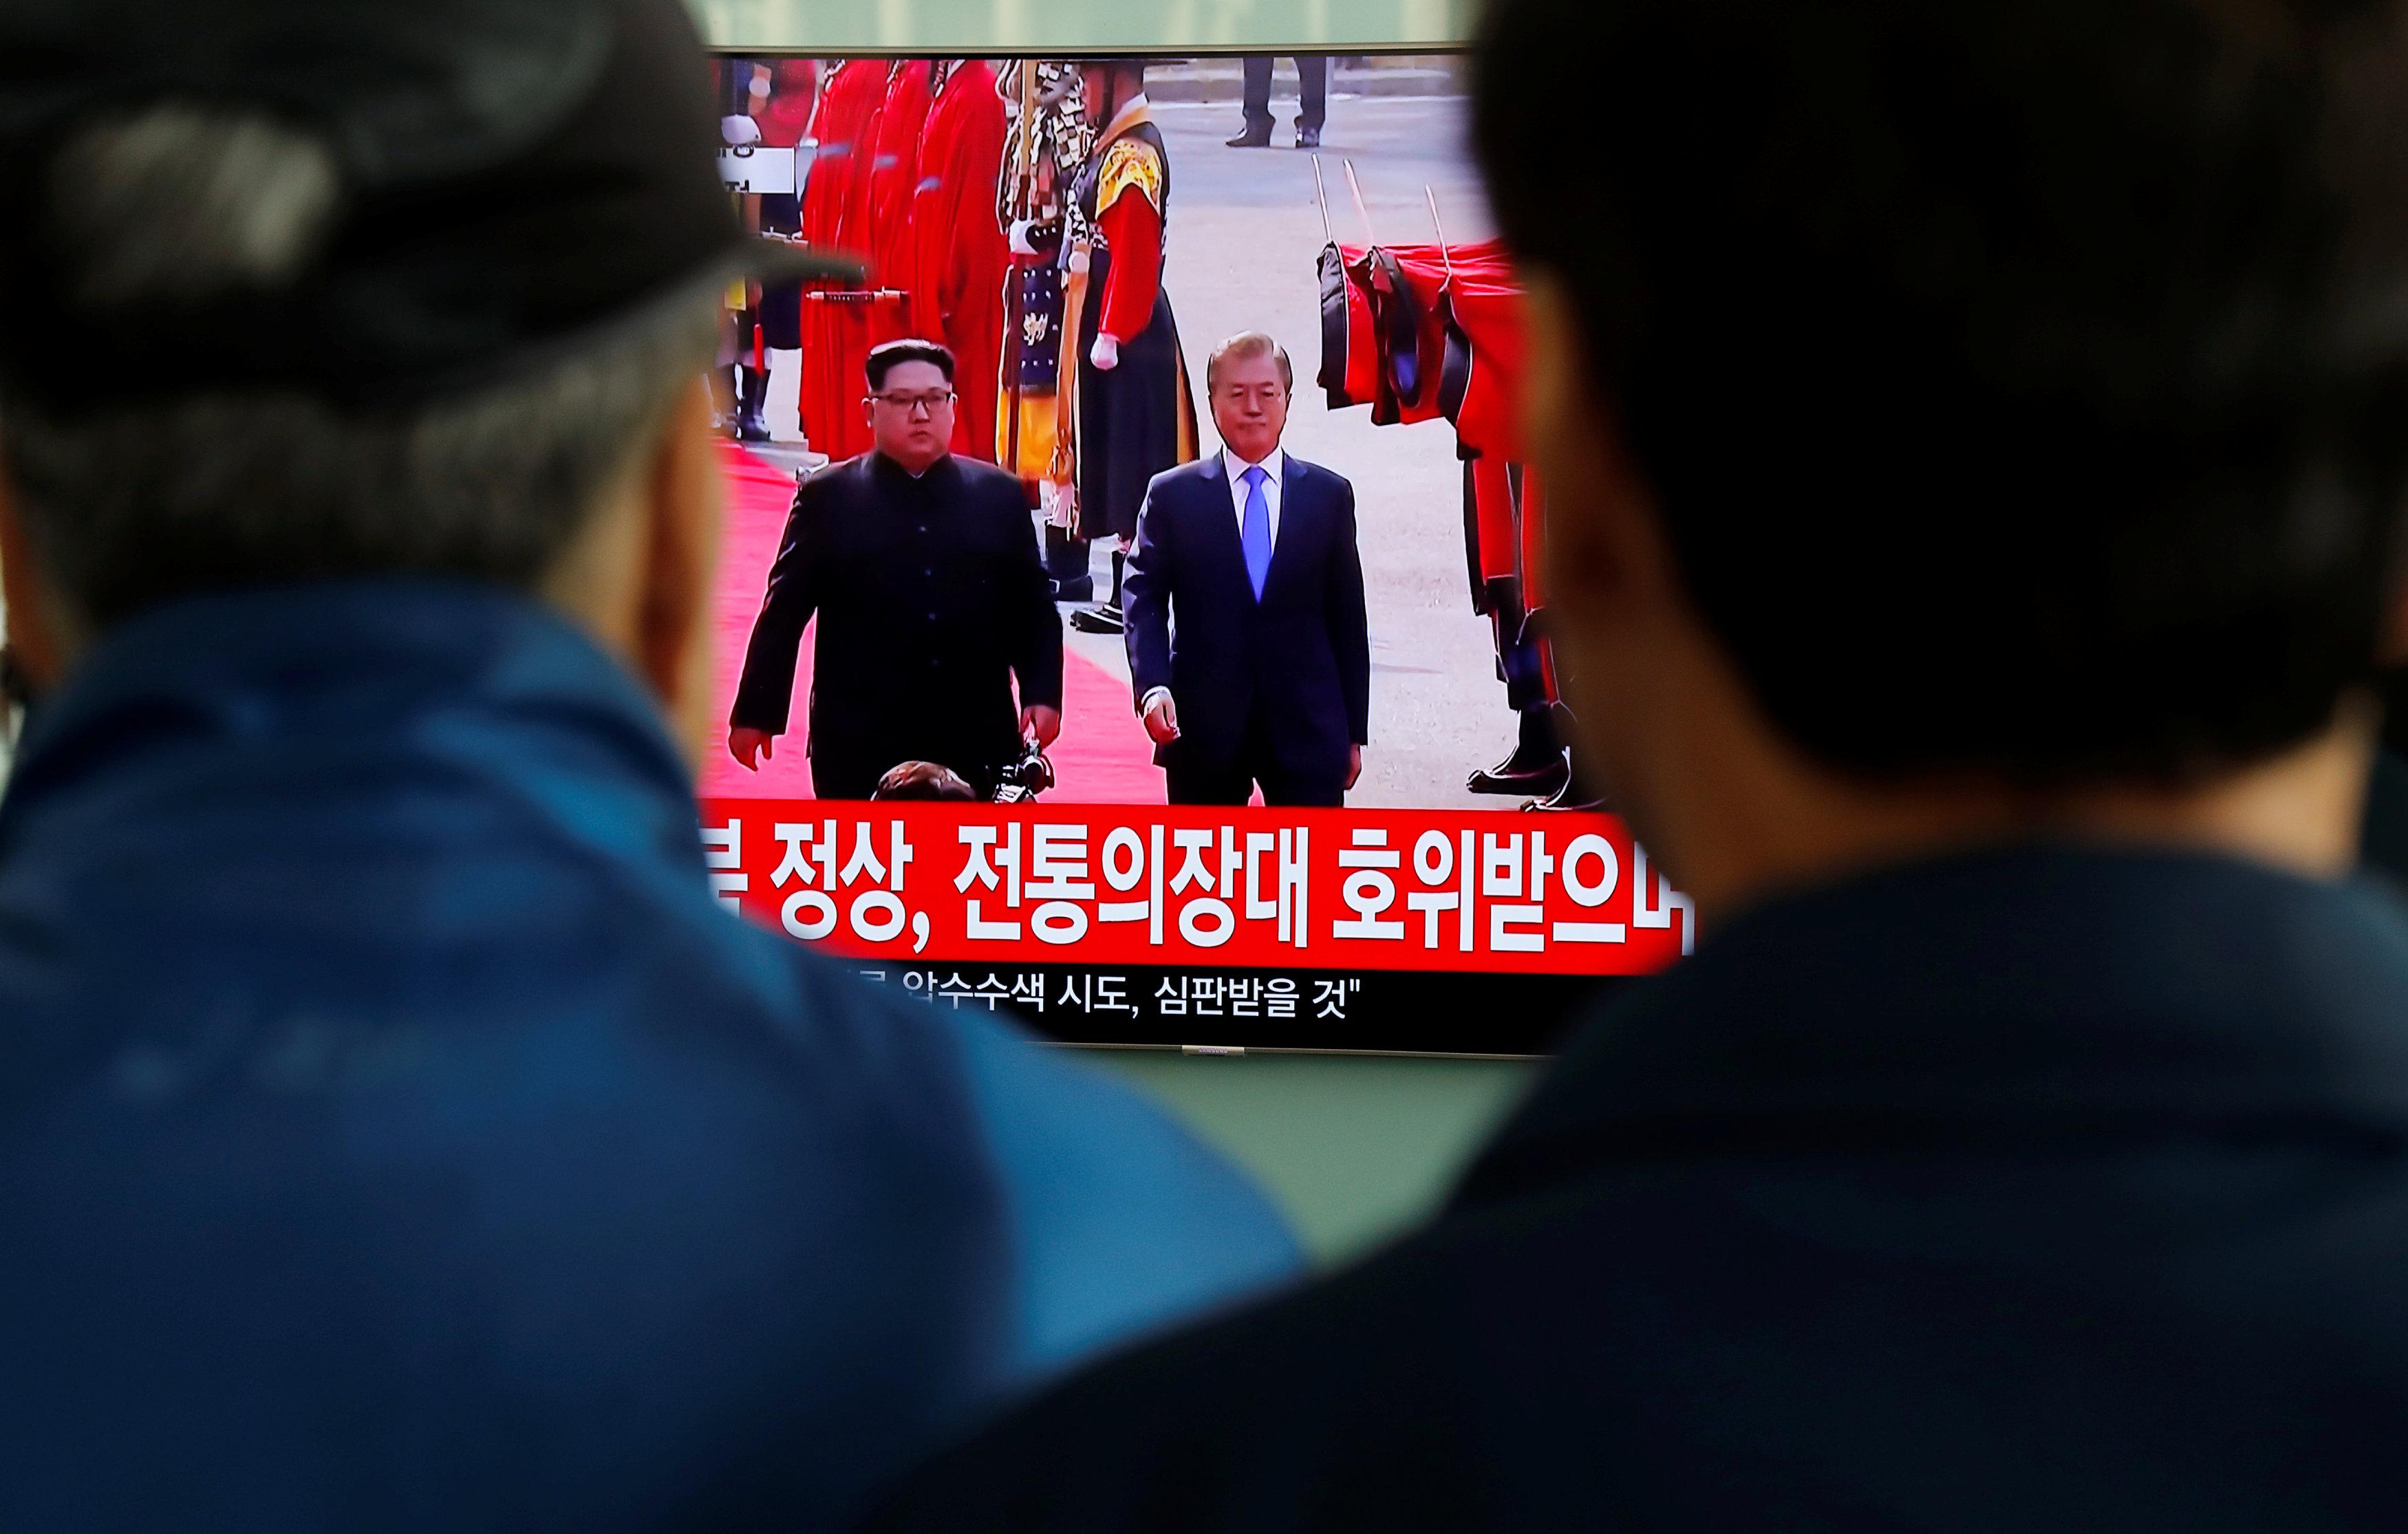 Dos hombre observan el encuentro en la estación de tren de Seúl. (REUTERS/Jorge Silva)